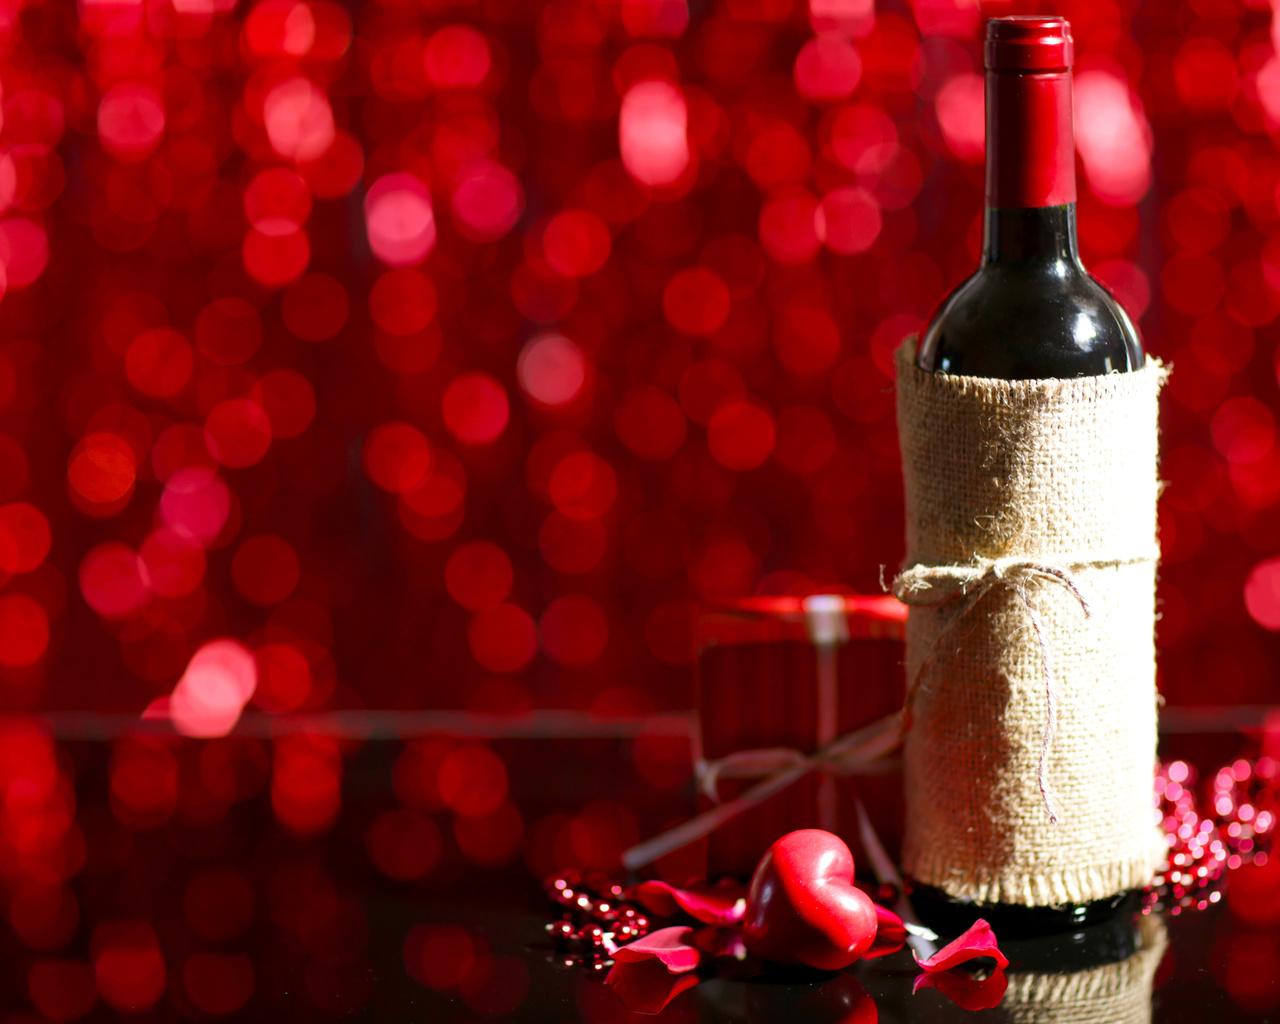 картинки праздник вино жена встречает мужа